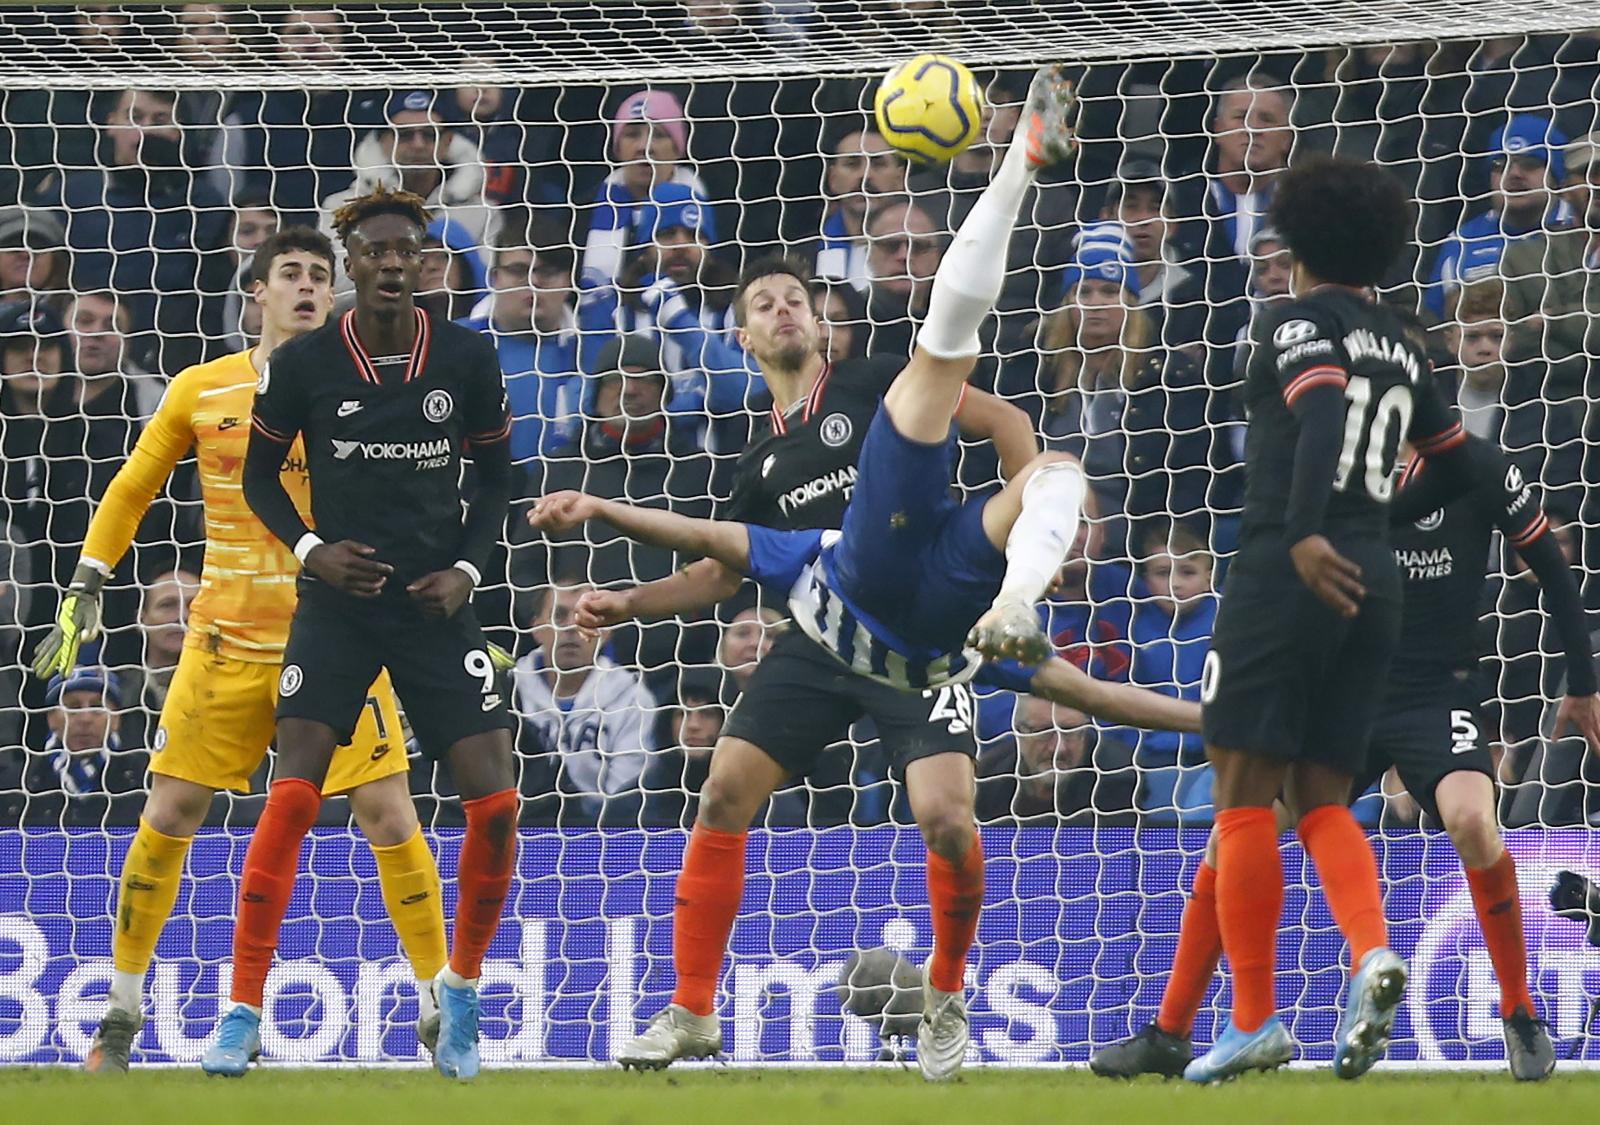 Premier League. Brighton - Chelsea. Gospodarze uratowali punkt. Fenomenalny gol Jahanbakhsha! - Sport WP SportoweFakty